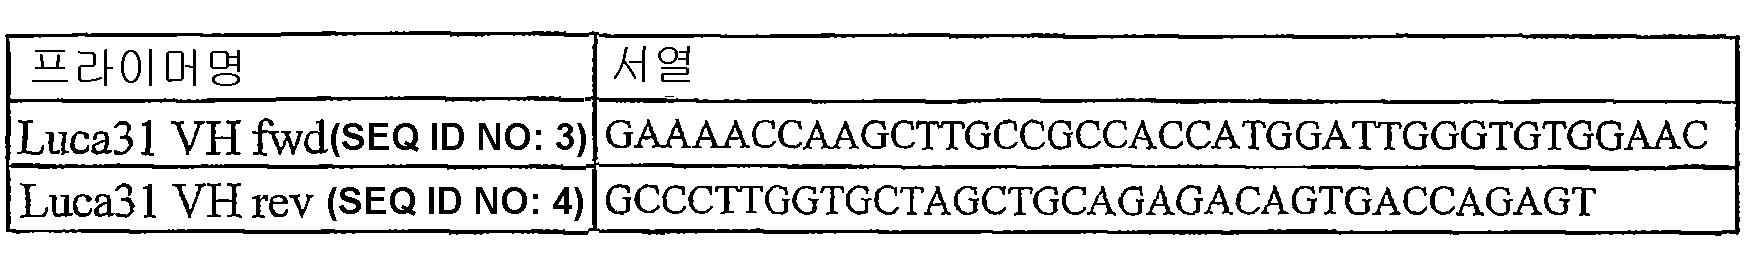 Figure 112012006402144-pct00038